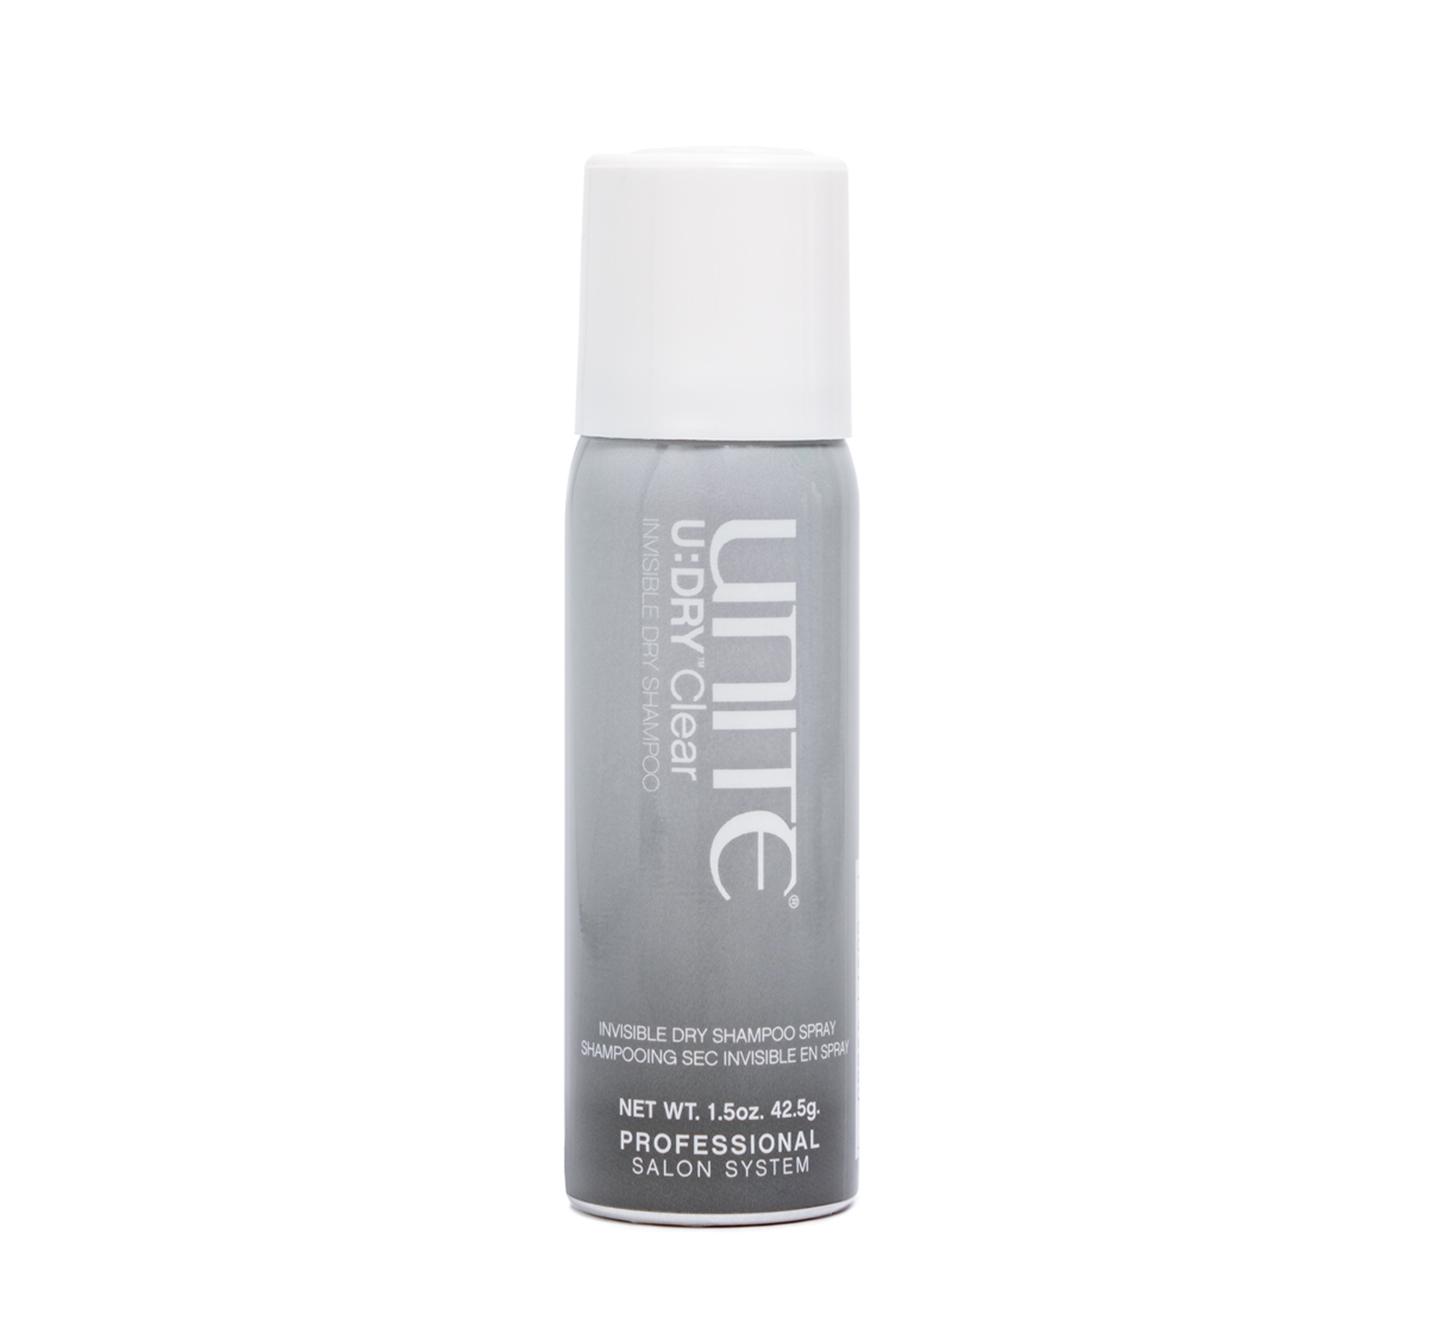 Unite U:DRY Clear Invisible Dry Shampoo 1.5oz